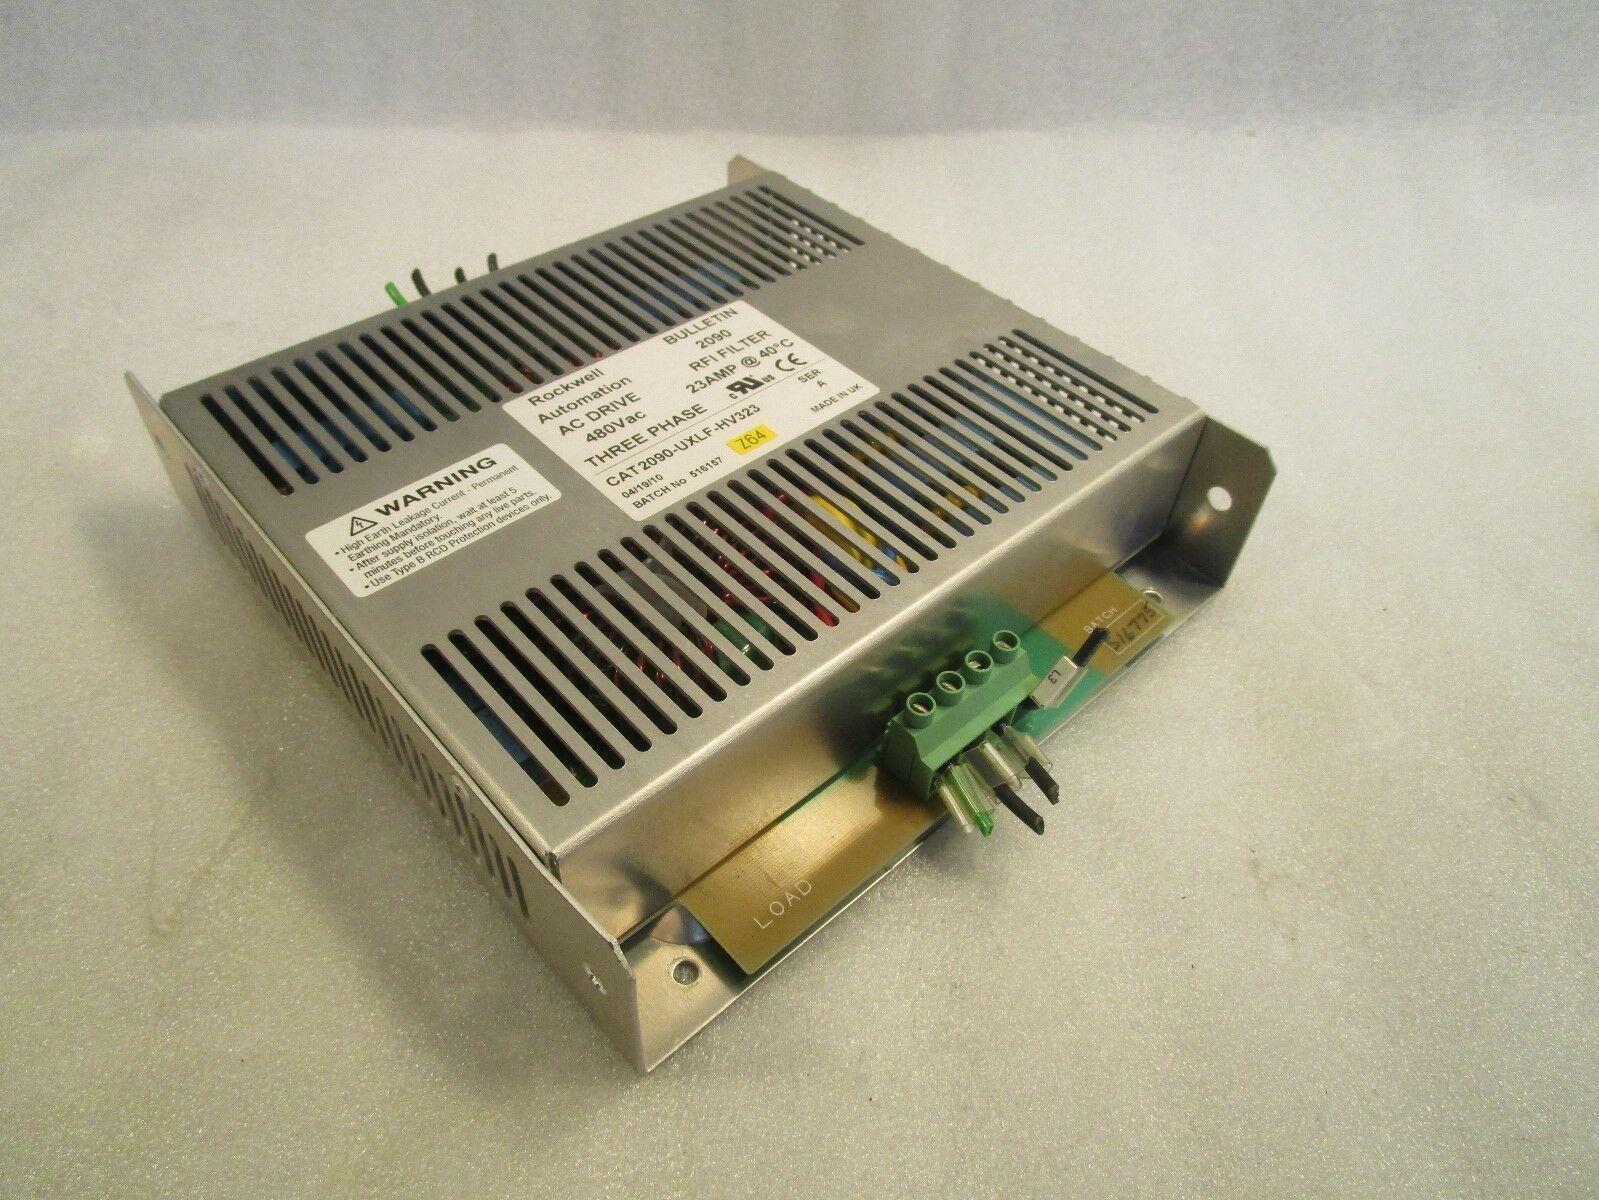 Rockwell Automation RFI Filter 2090 Cat 2090-UXLF-HV323